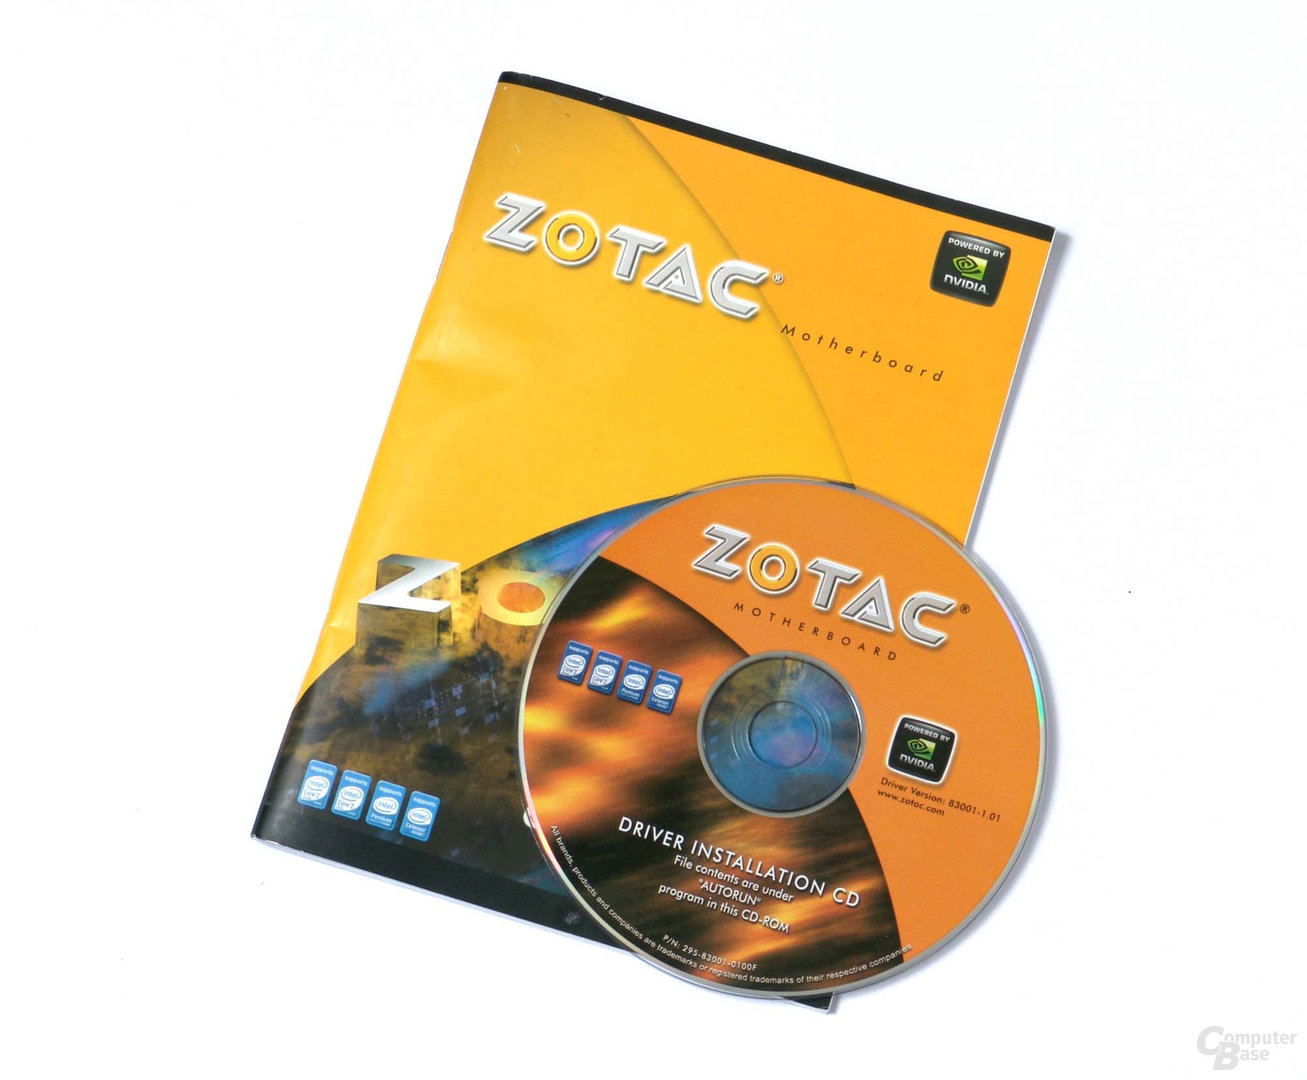 Zotac GeForce 9300-ITX WiFi (GF9300-I-E)